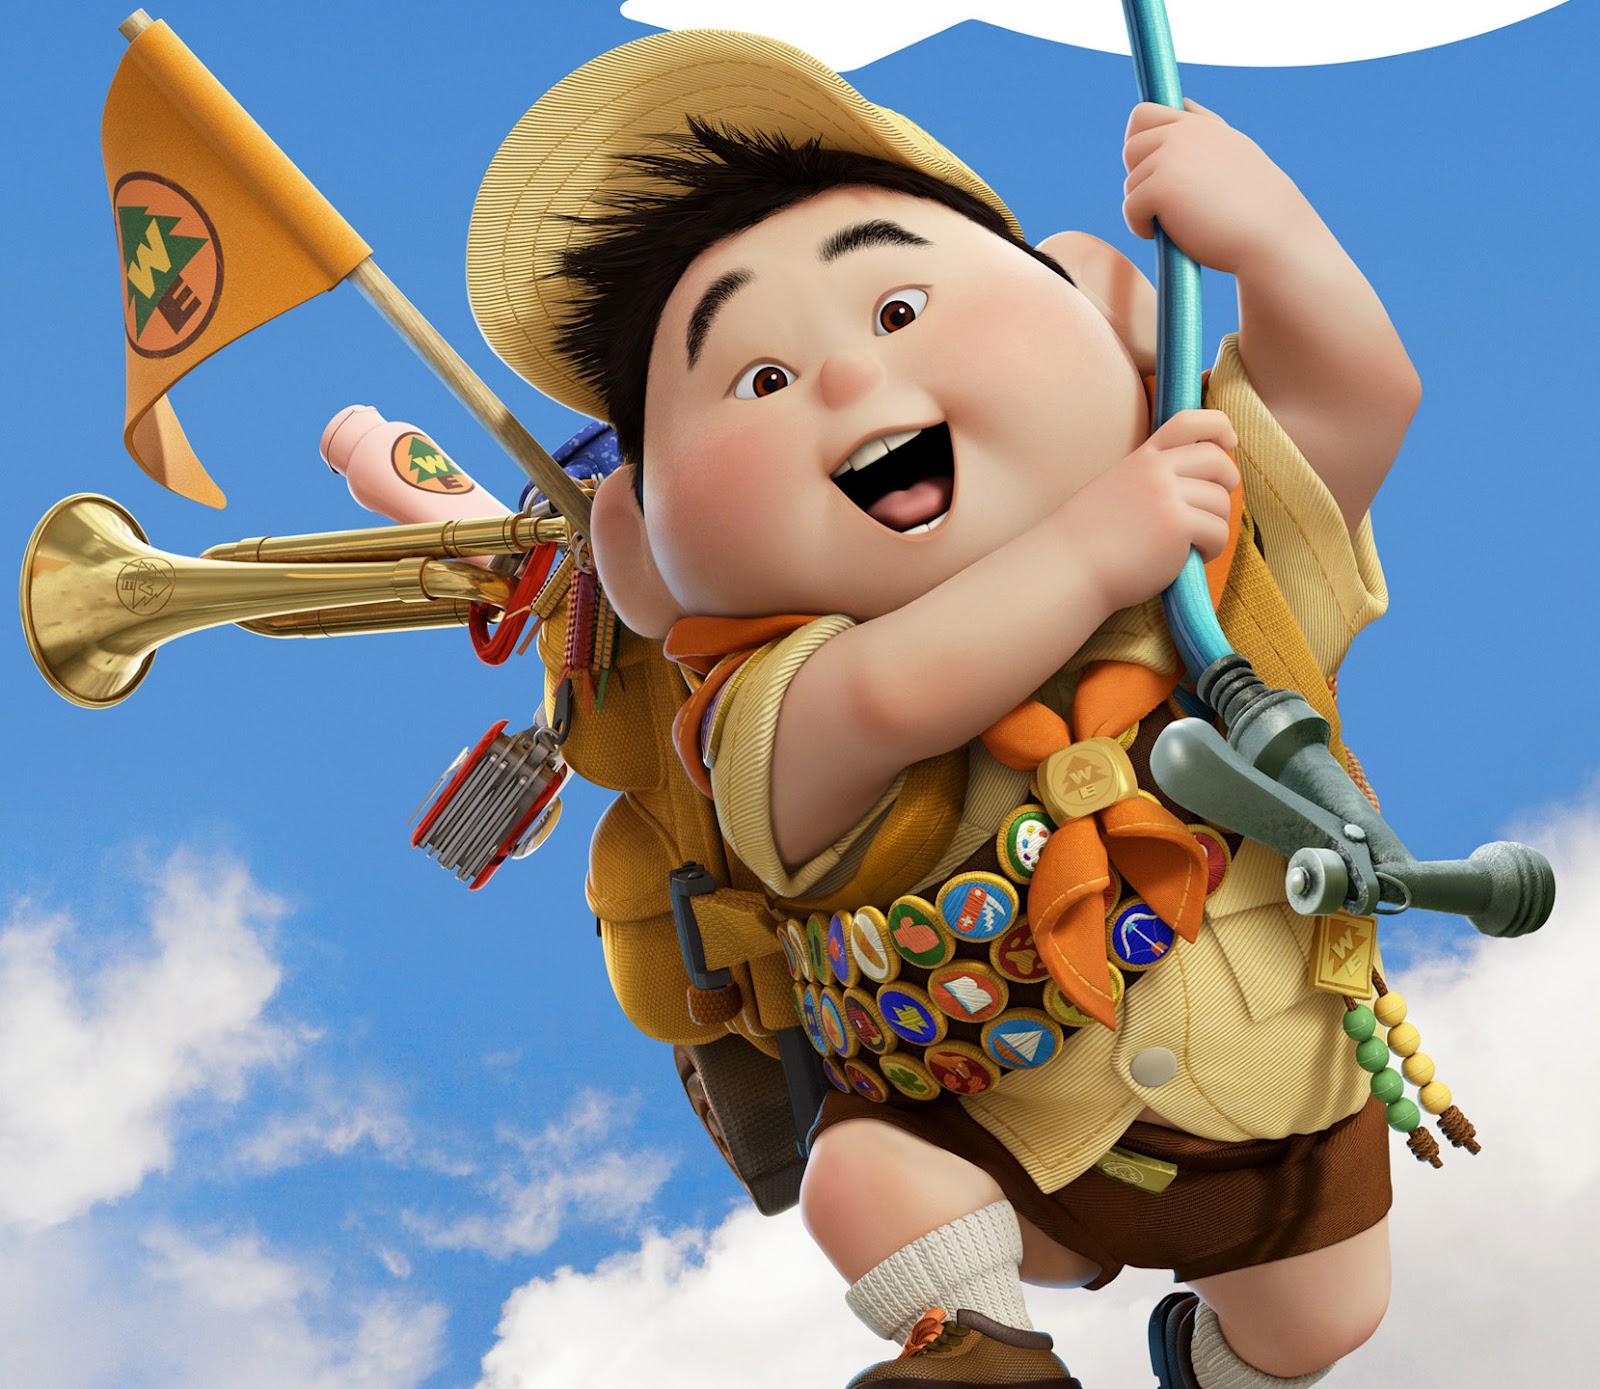 Disney: Disney Characters Pixar Up Russell For Kids Wallpaper